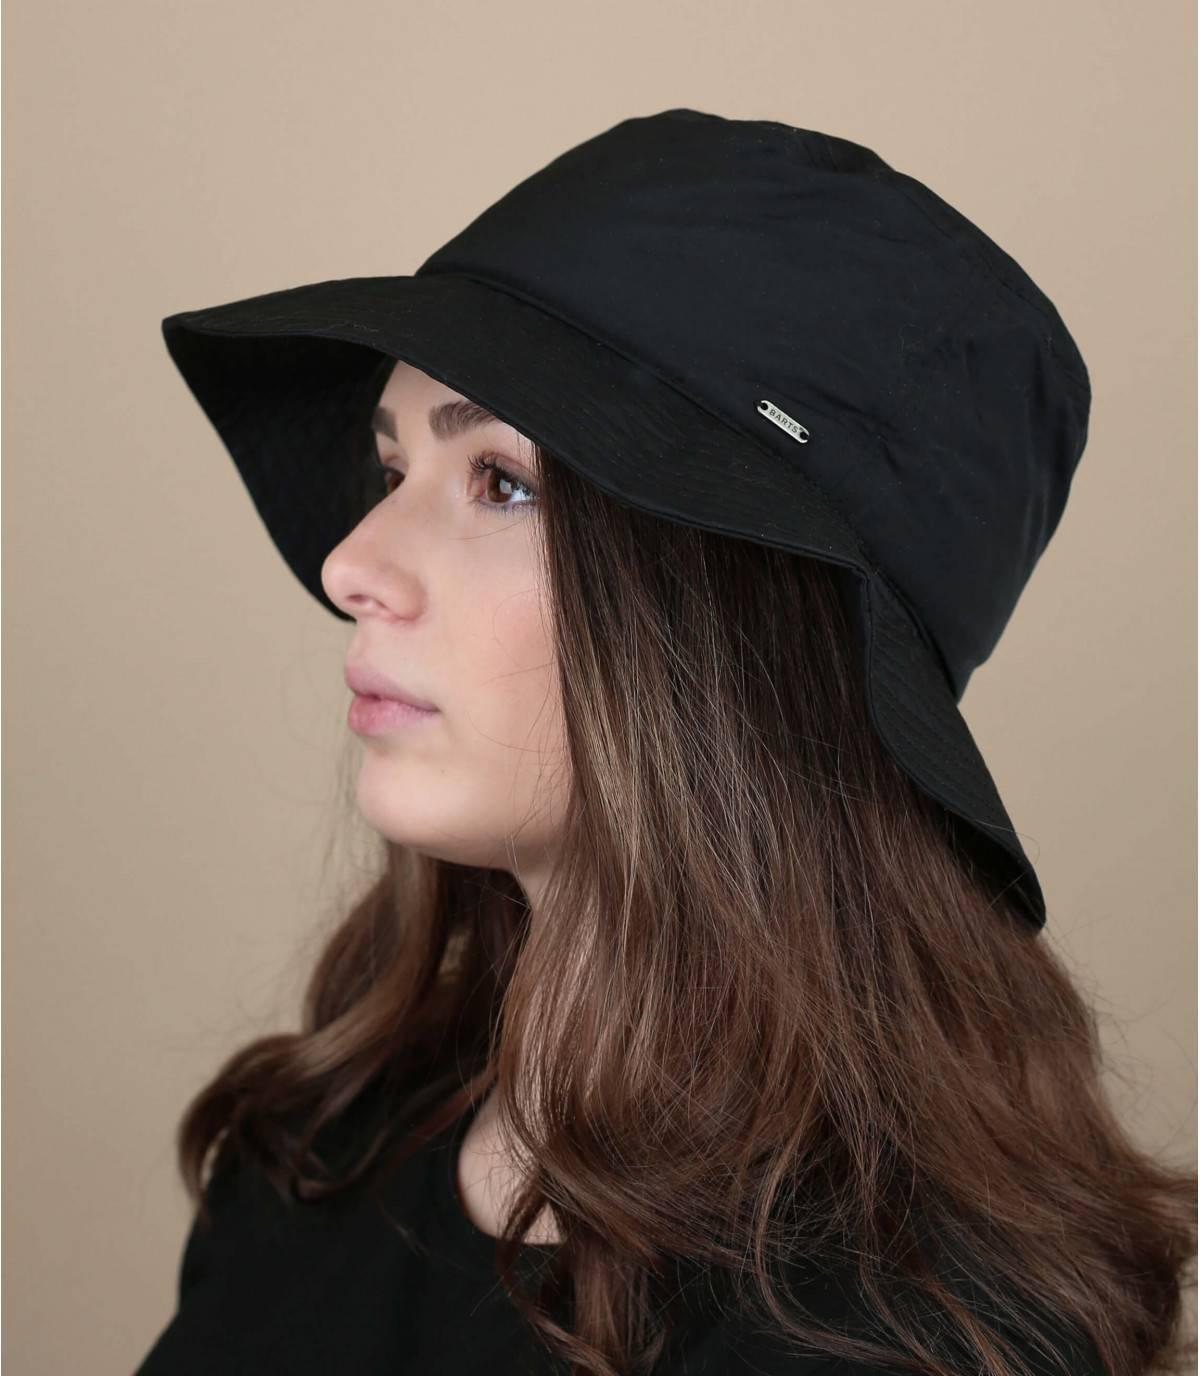 Sombrero pescador negro repelente al agua